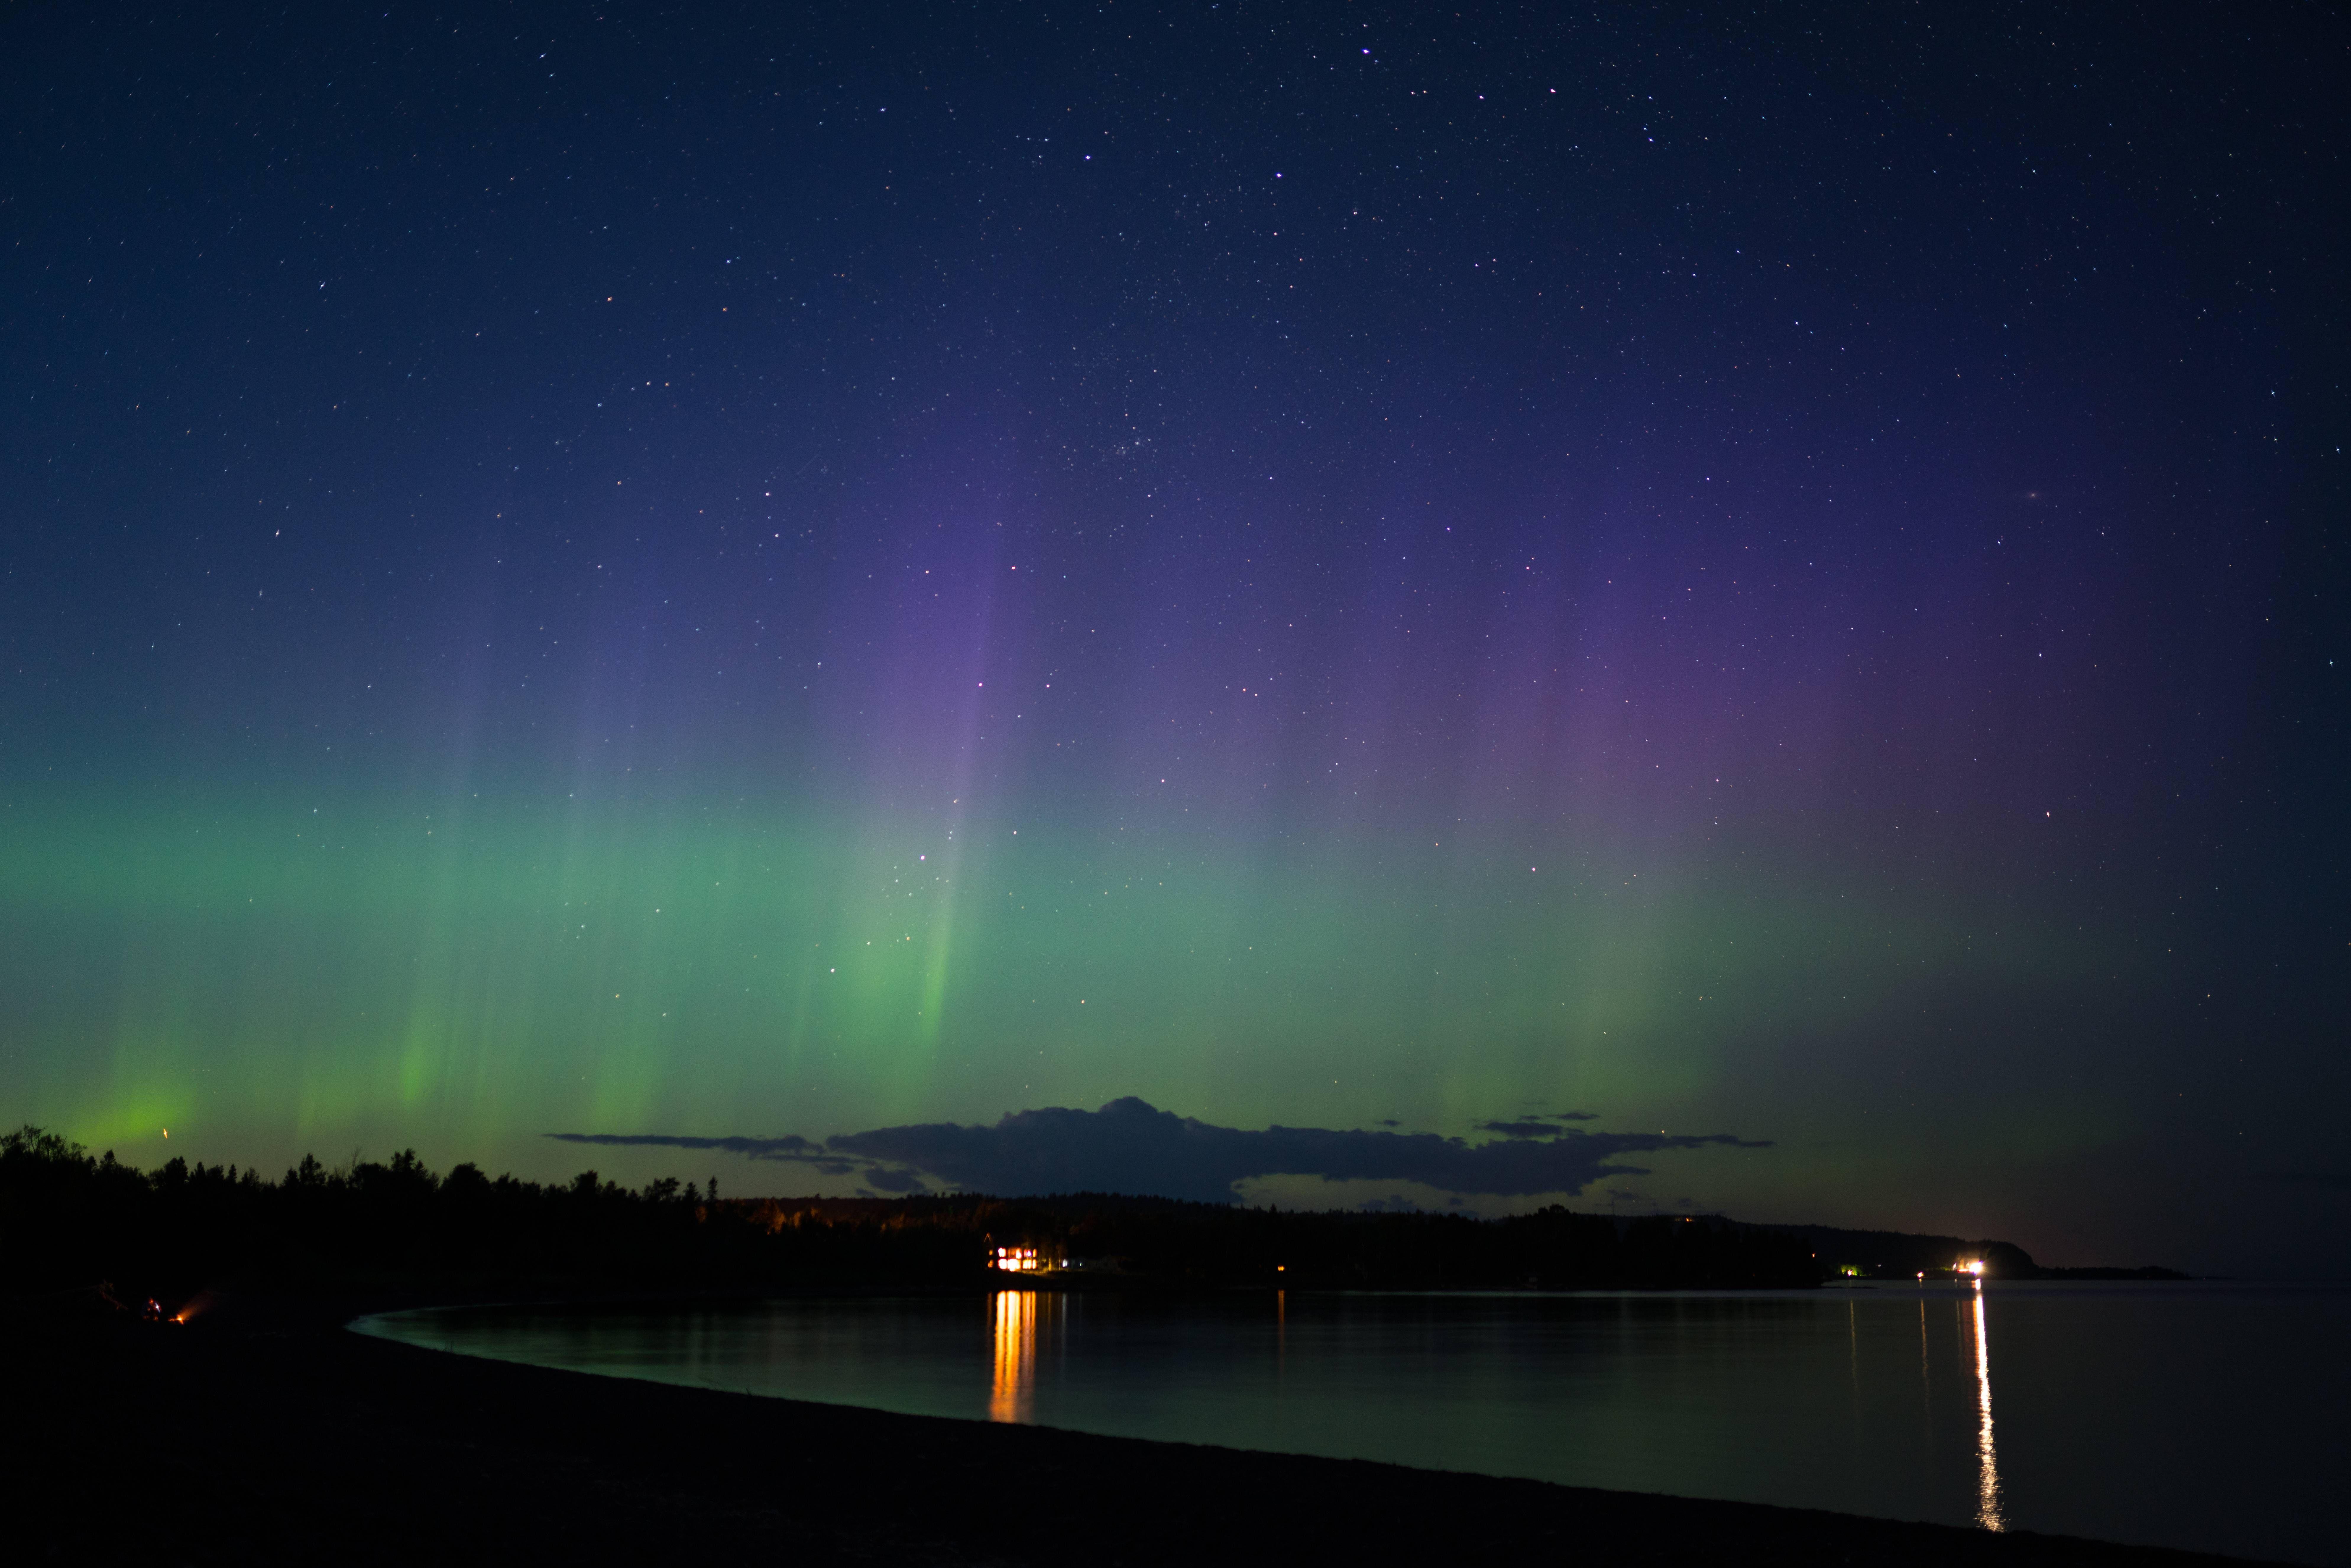 aurora borealis on lake superior minnesota 7952x5304 oc